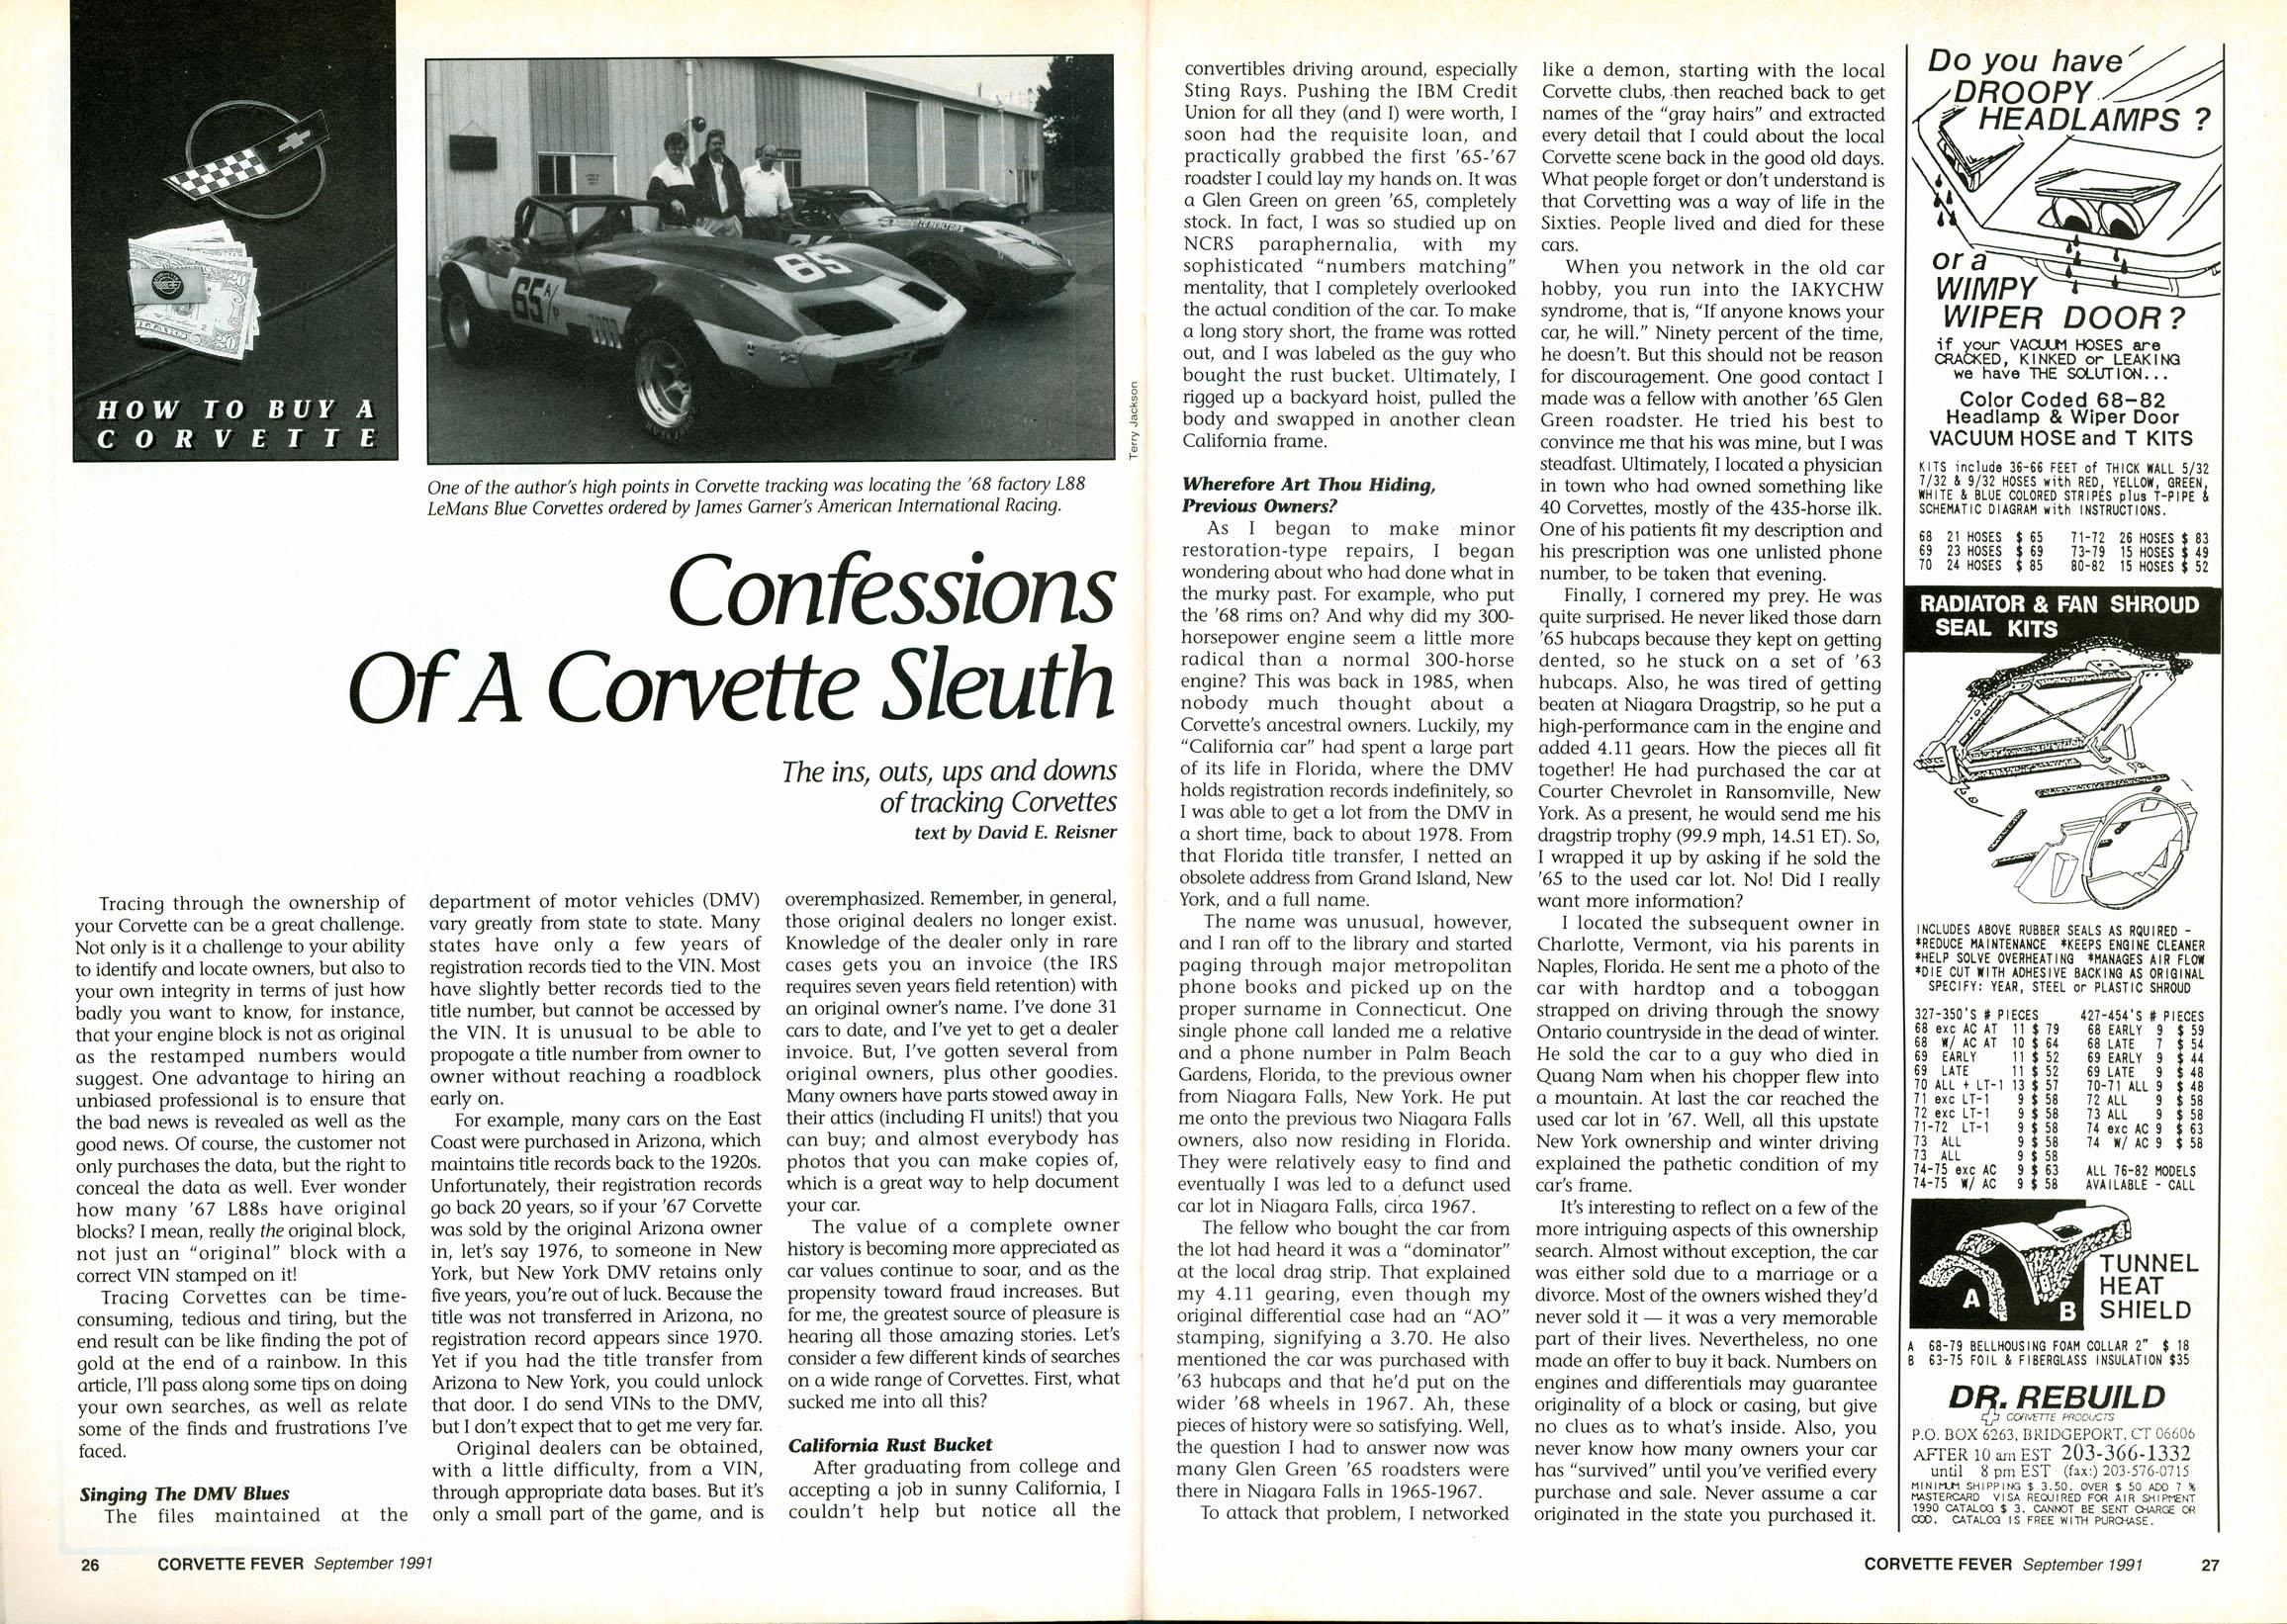 Corvette Fever September 1991: Confessions Of A Corvette